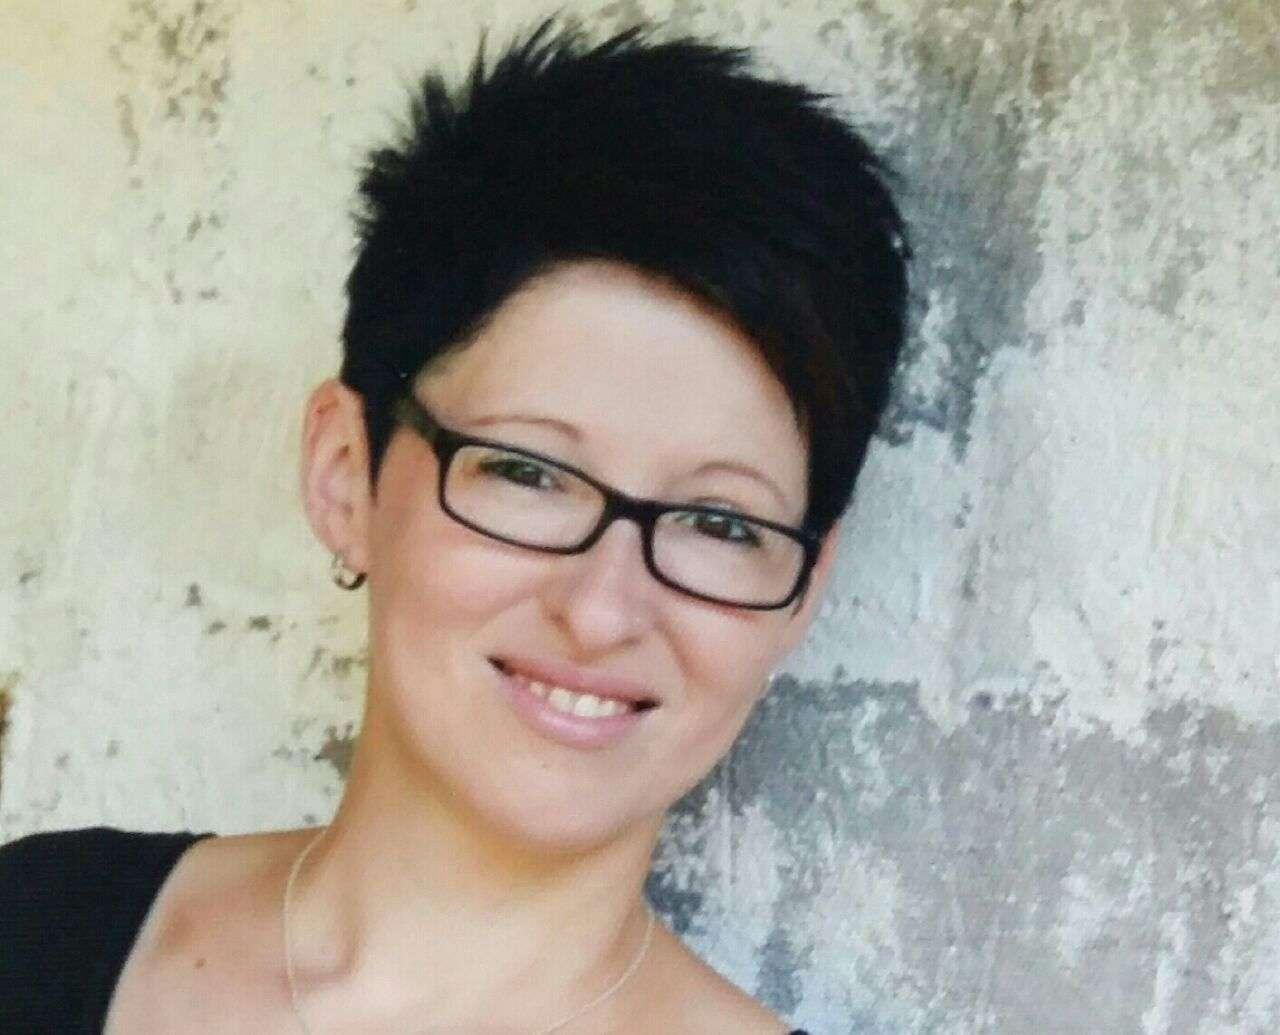 Melanie Camanzo : Festwirt